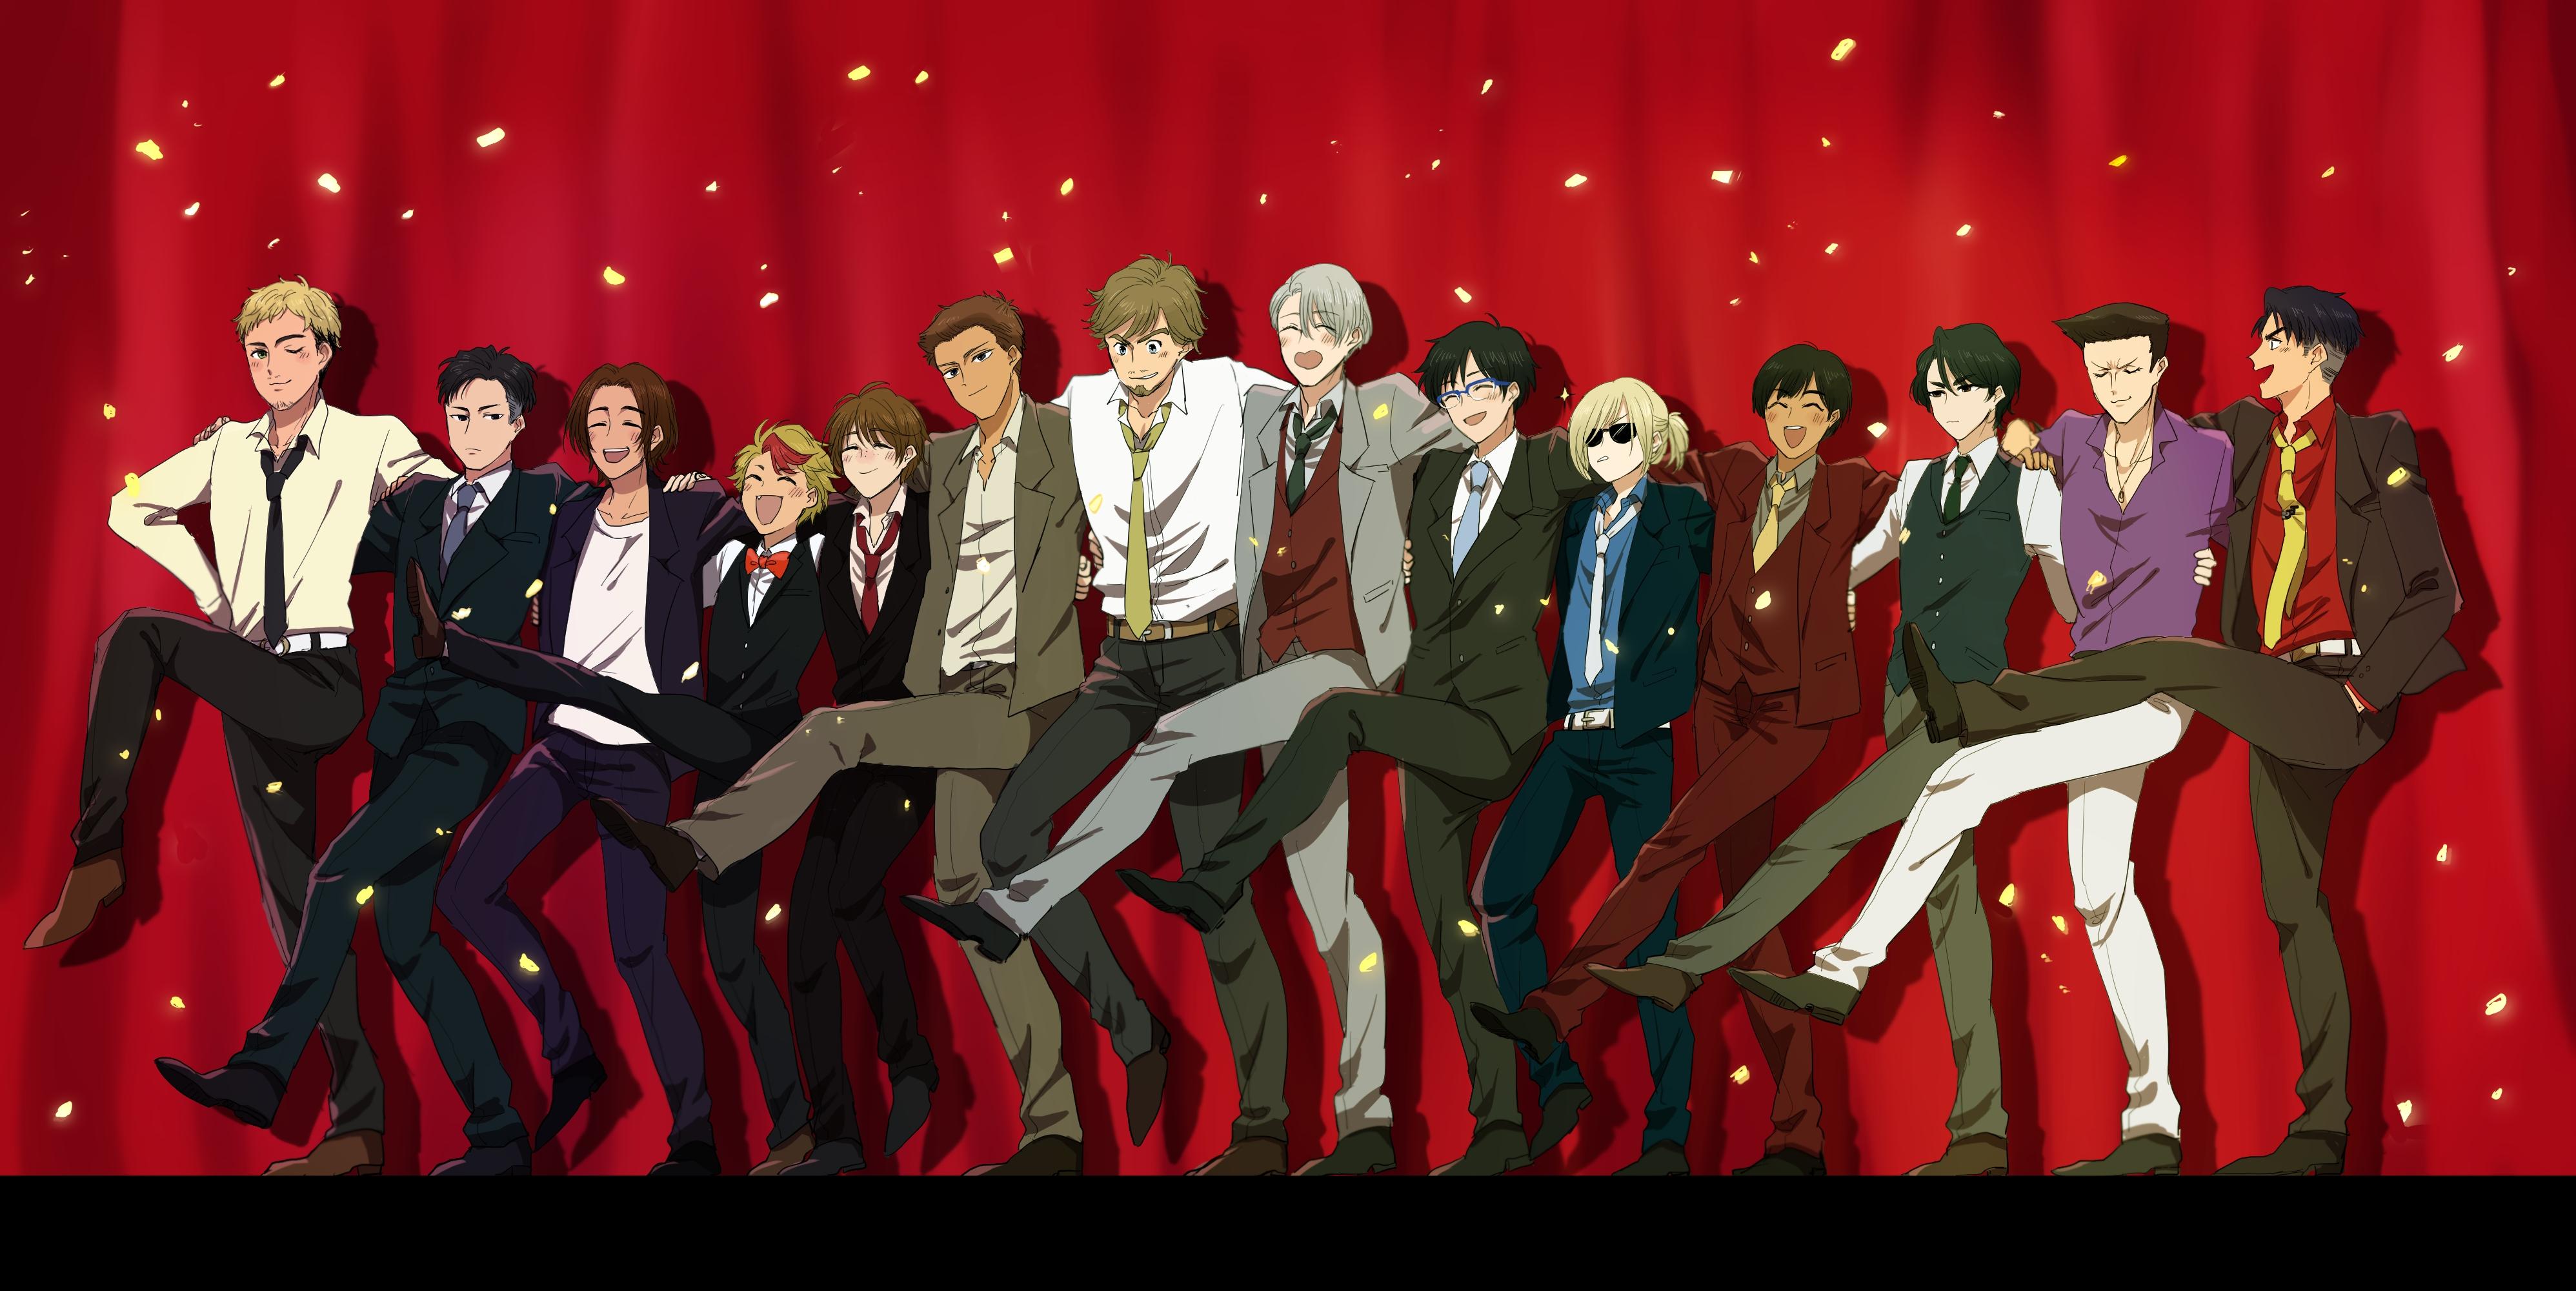 Yuri On Ice Wallpaper Zerochan Anime Image Board